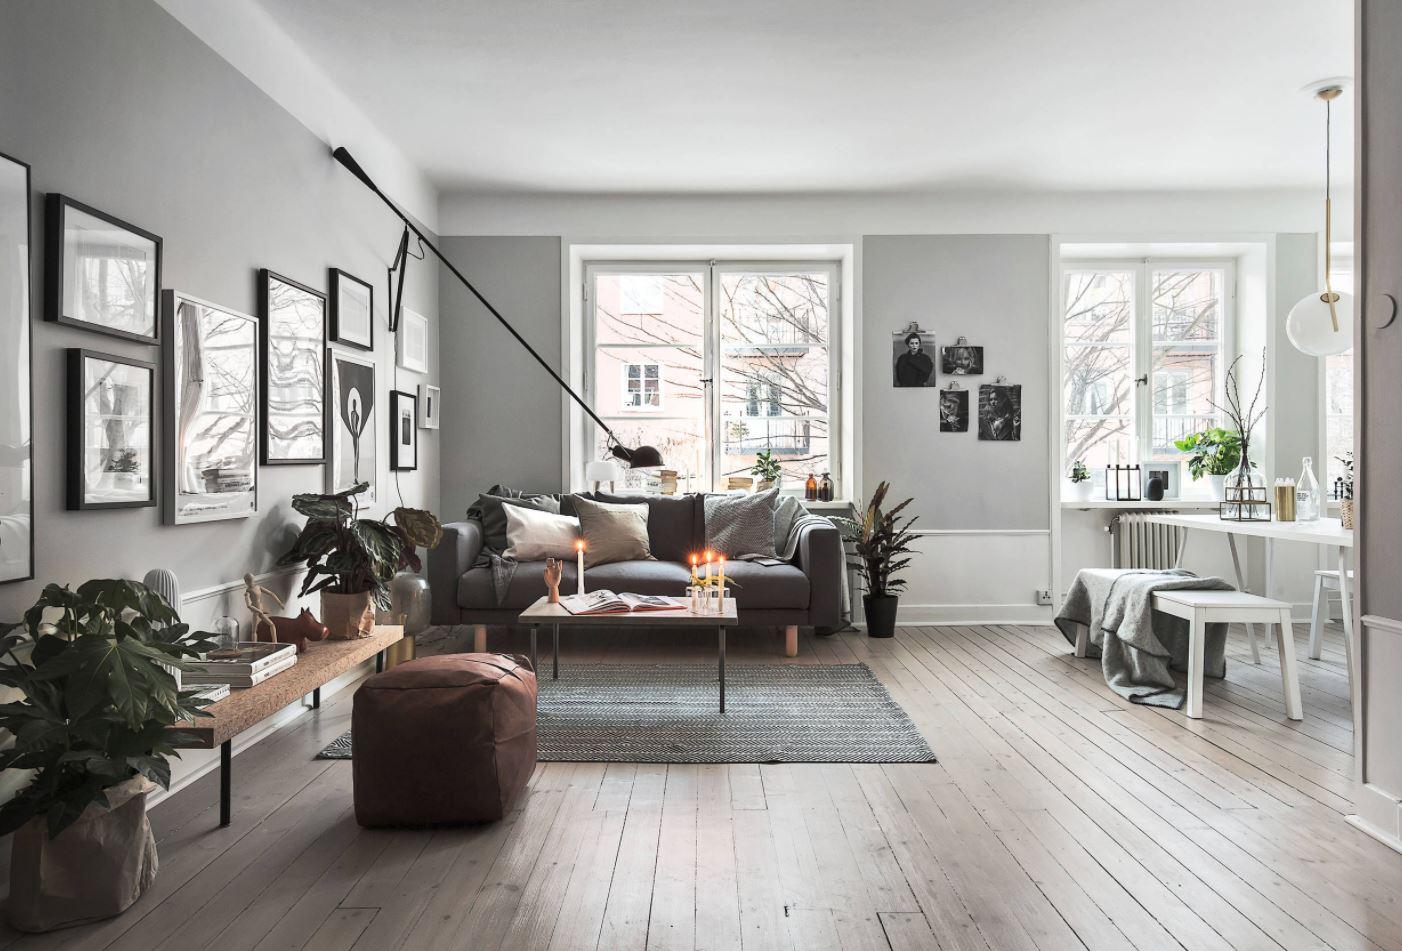 идеи интерьера вашей квартиры фото 8